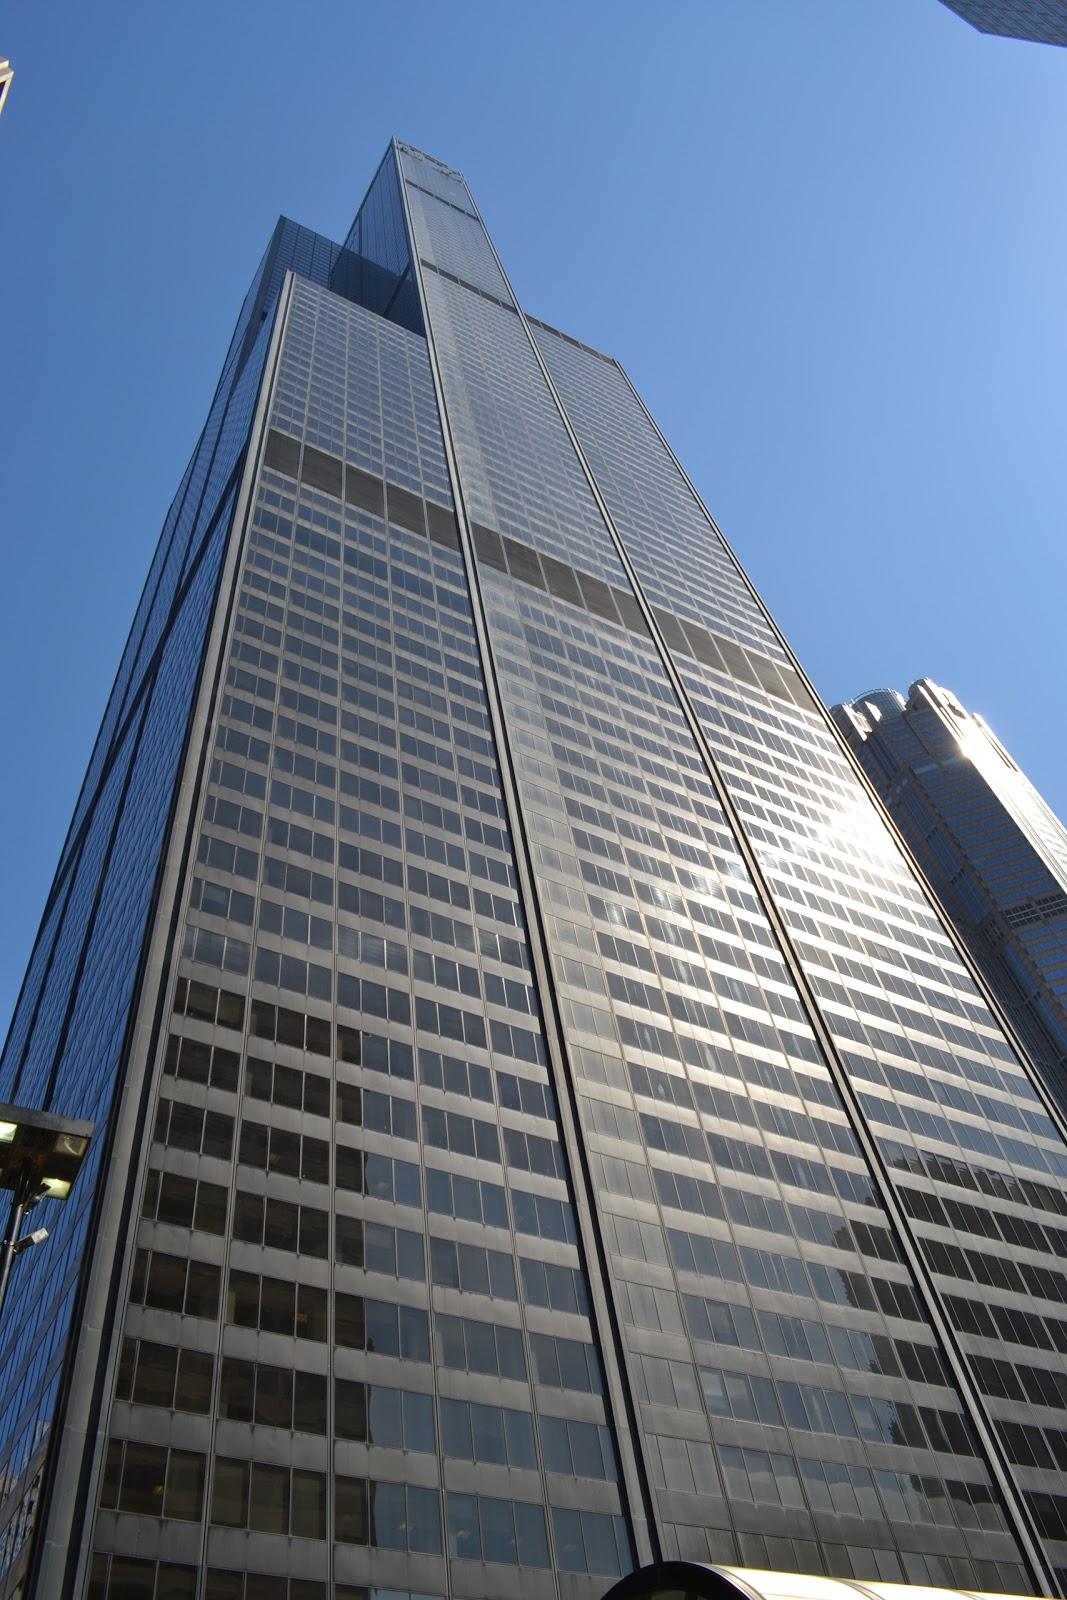 Kasibhattamuralikrishna Sears Willis Tower In Chicago